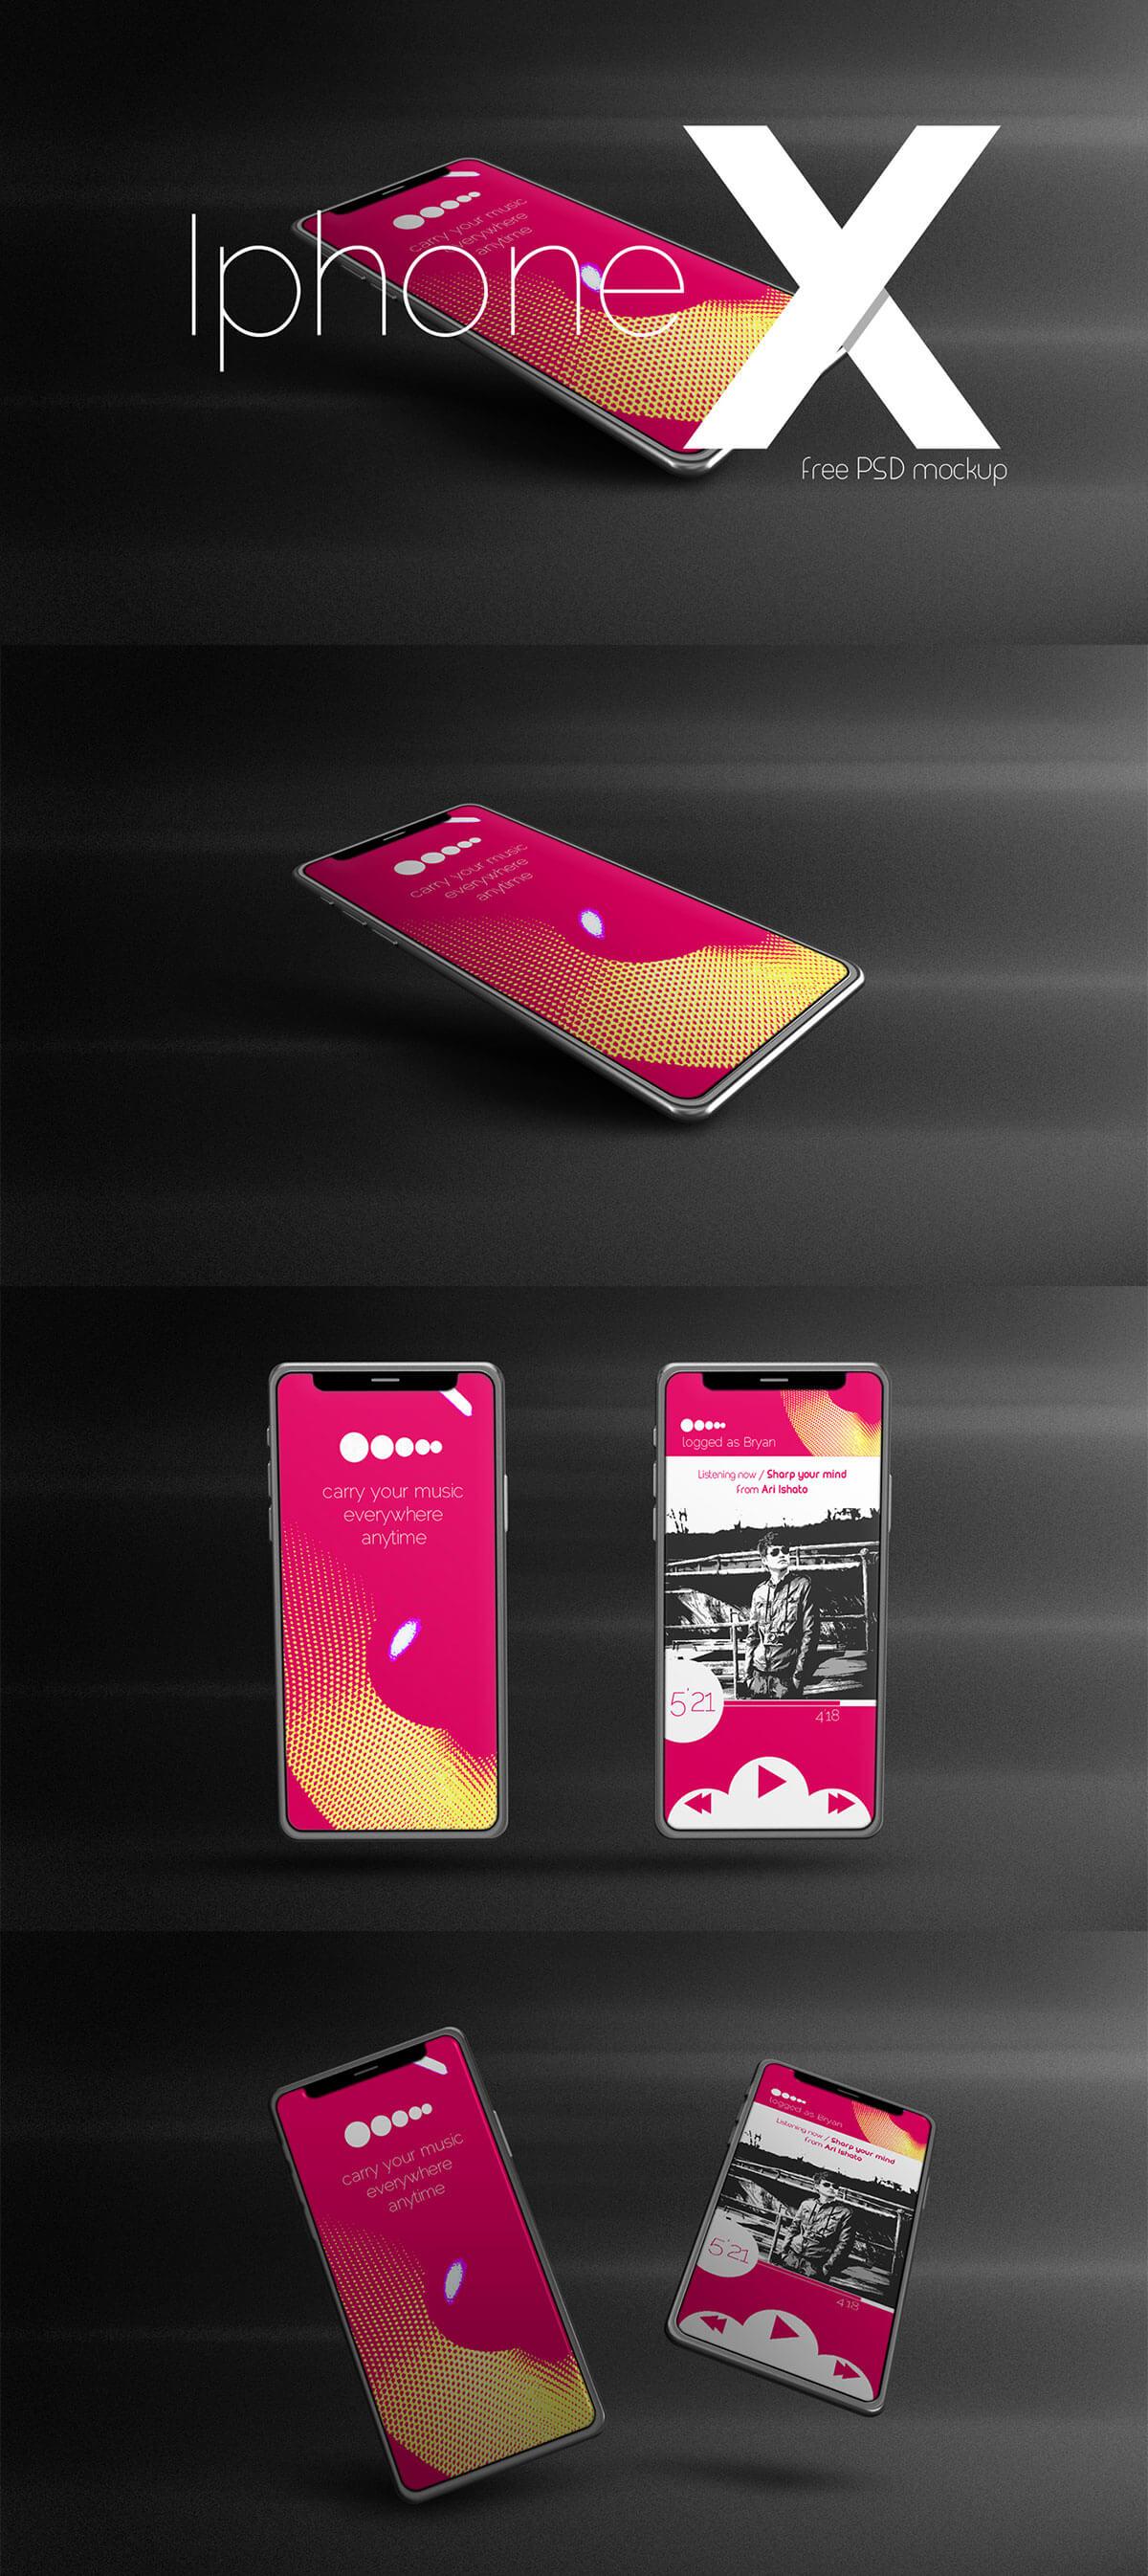 Free Iphone X PSD Mockup